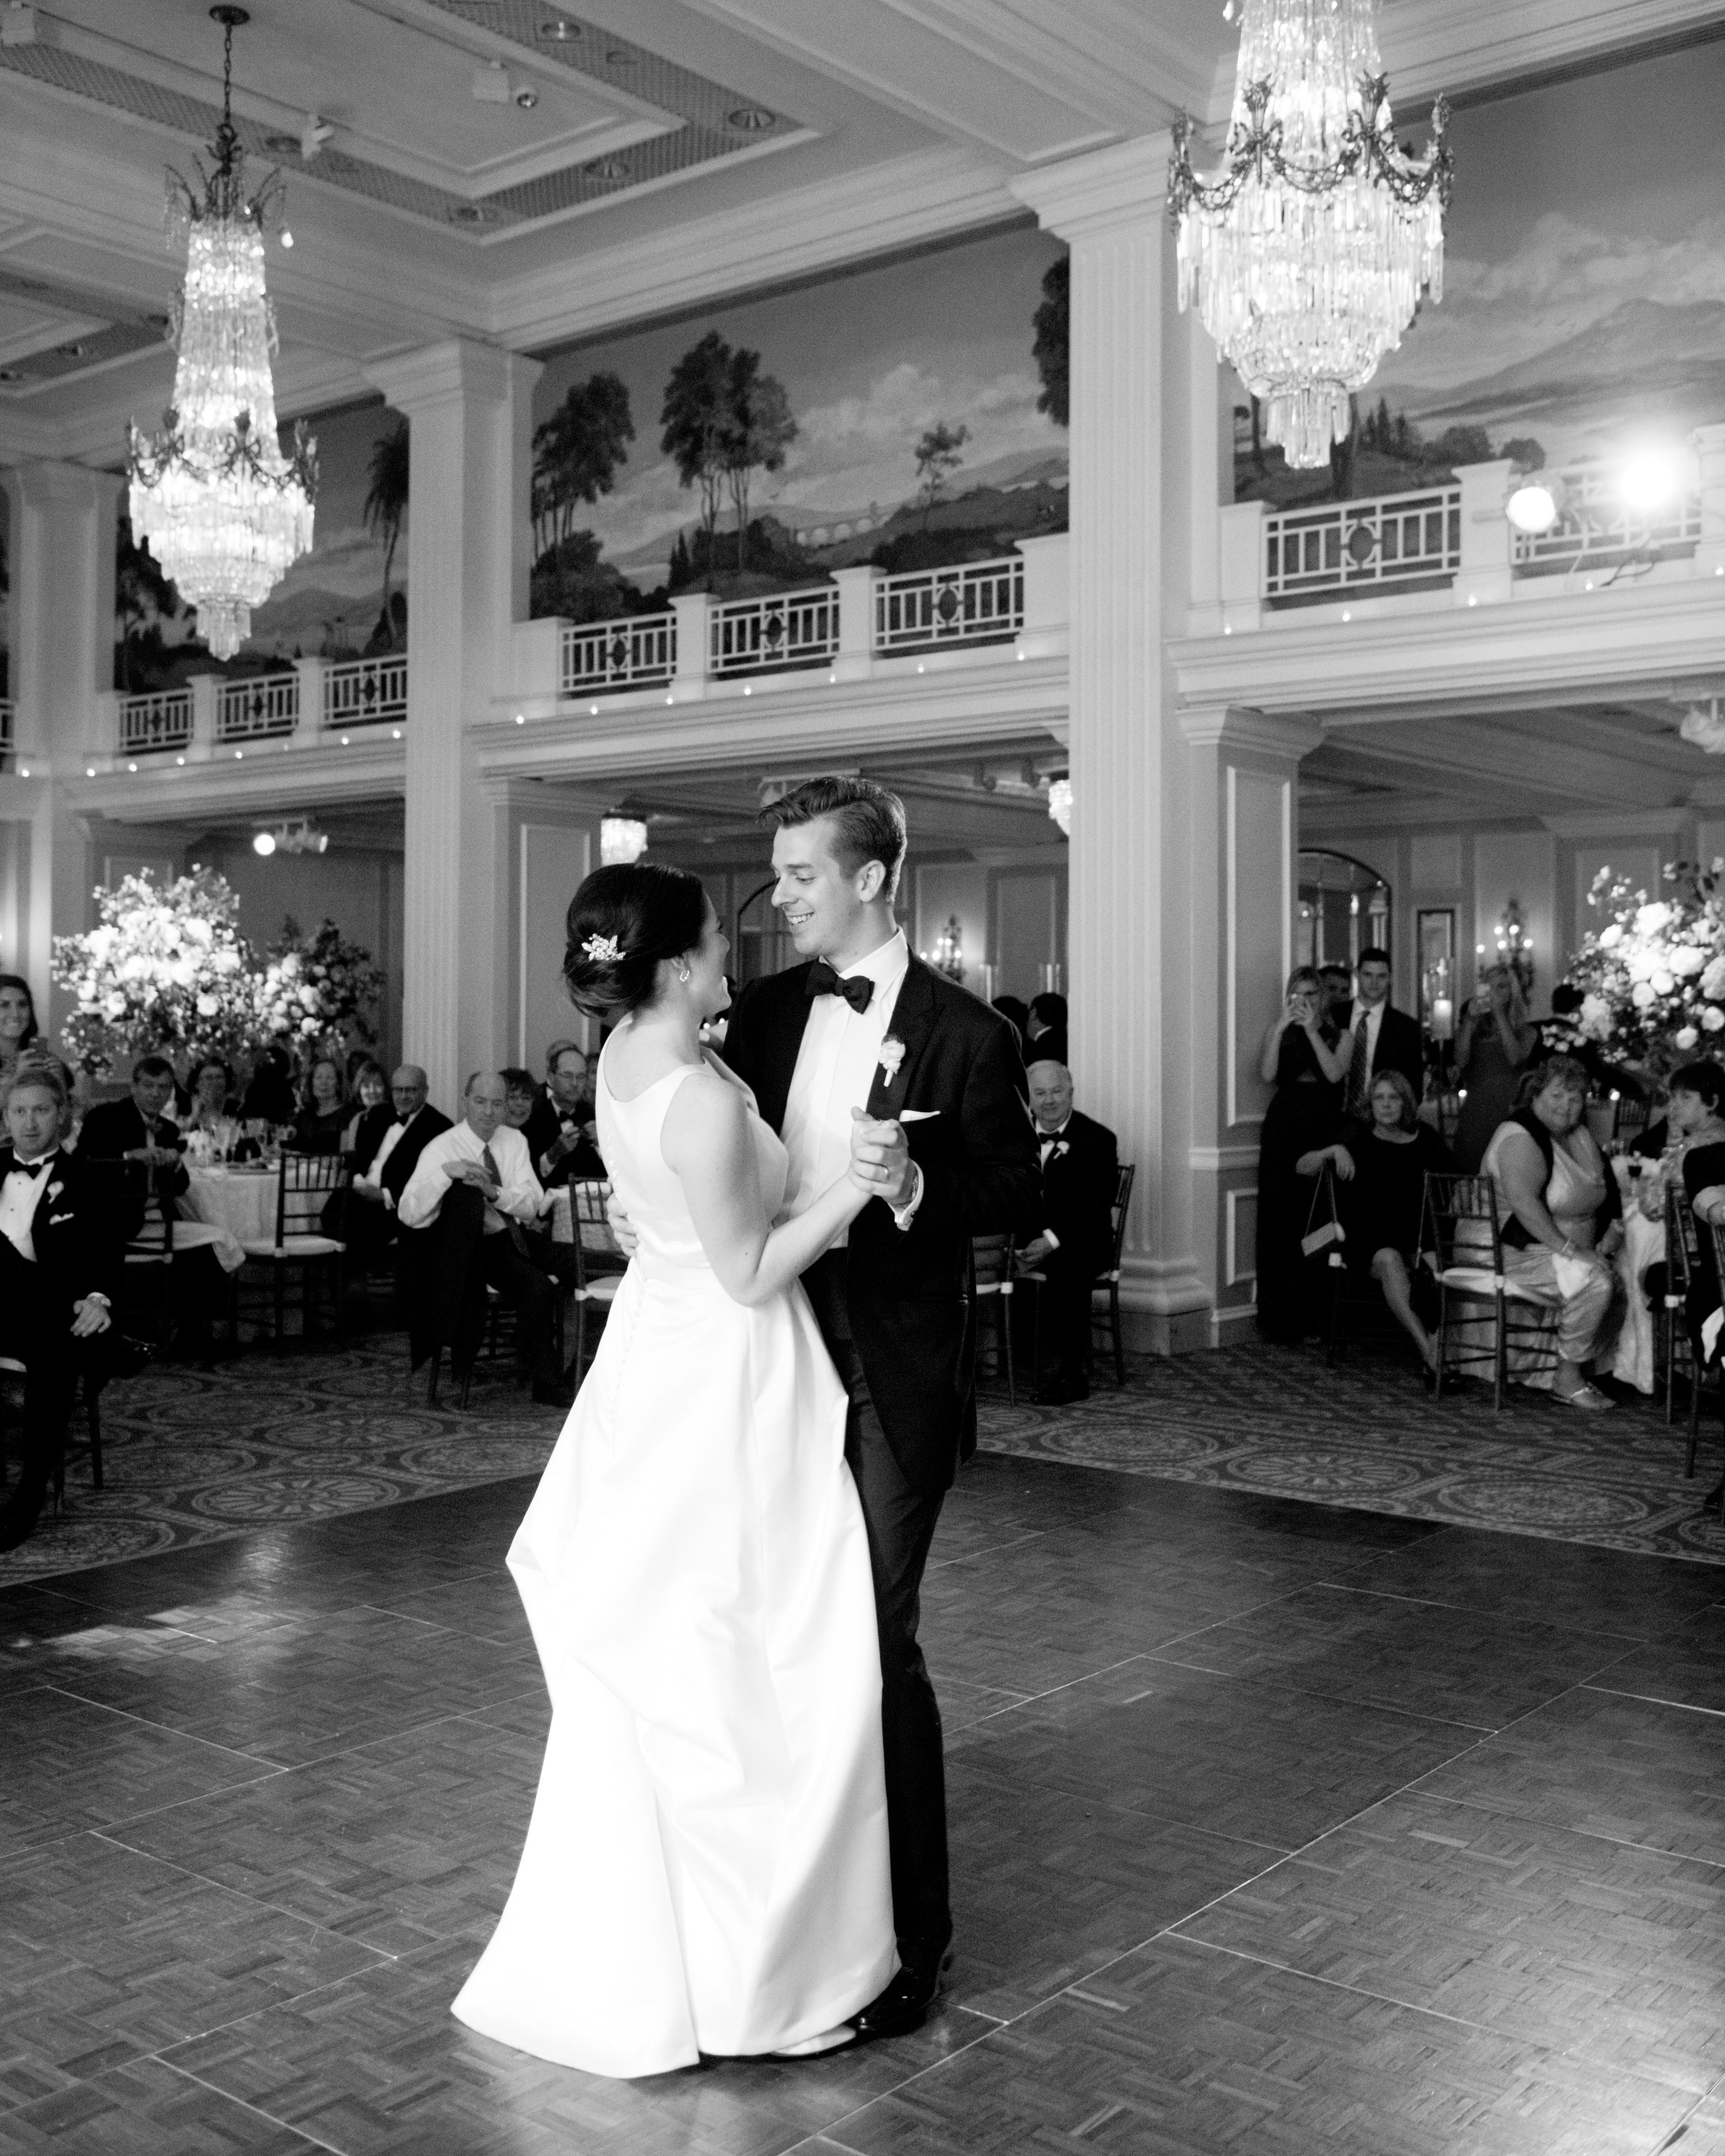 taylor-john-wedding-firstdance-641-s112507-0116.jpg